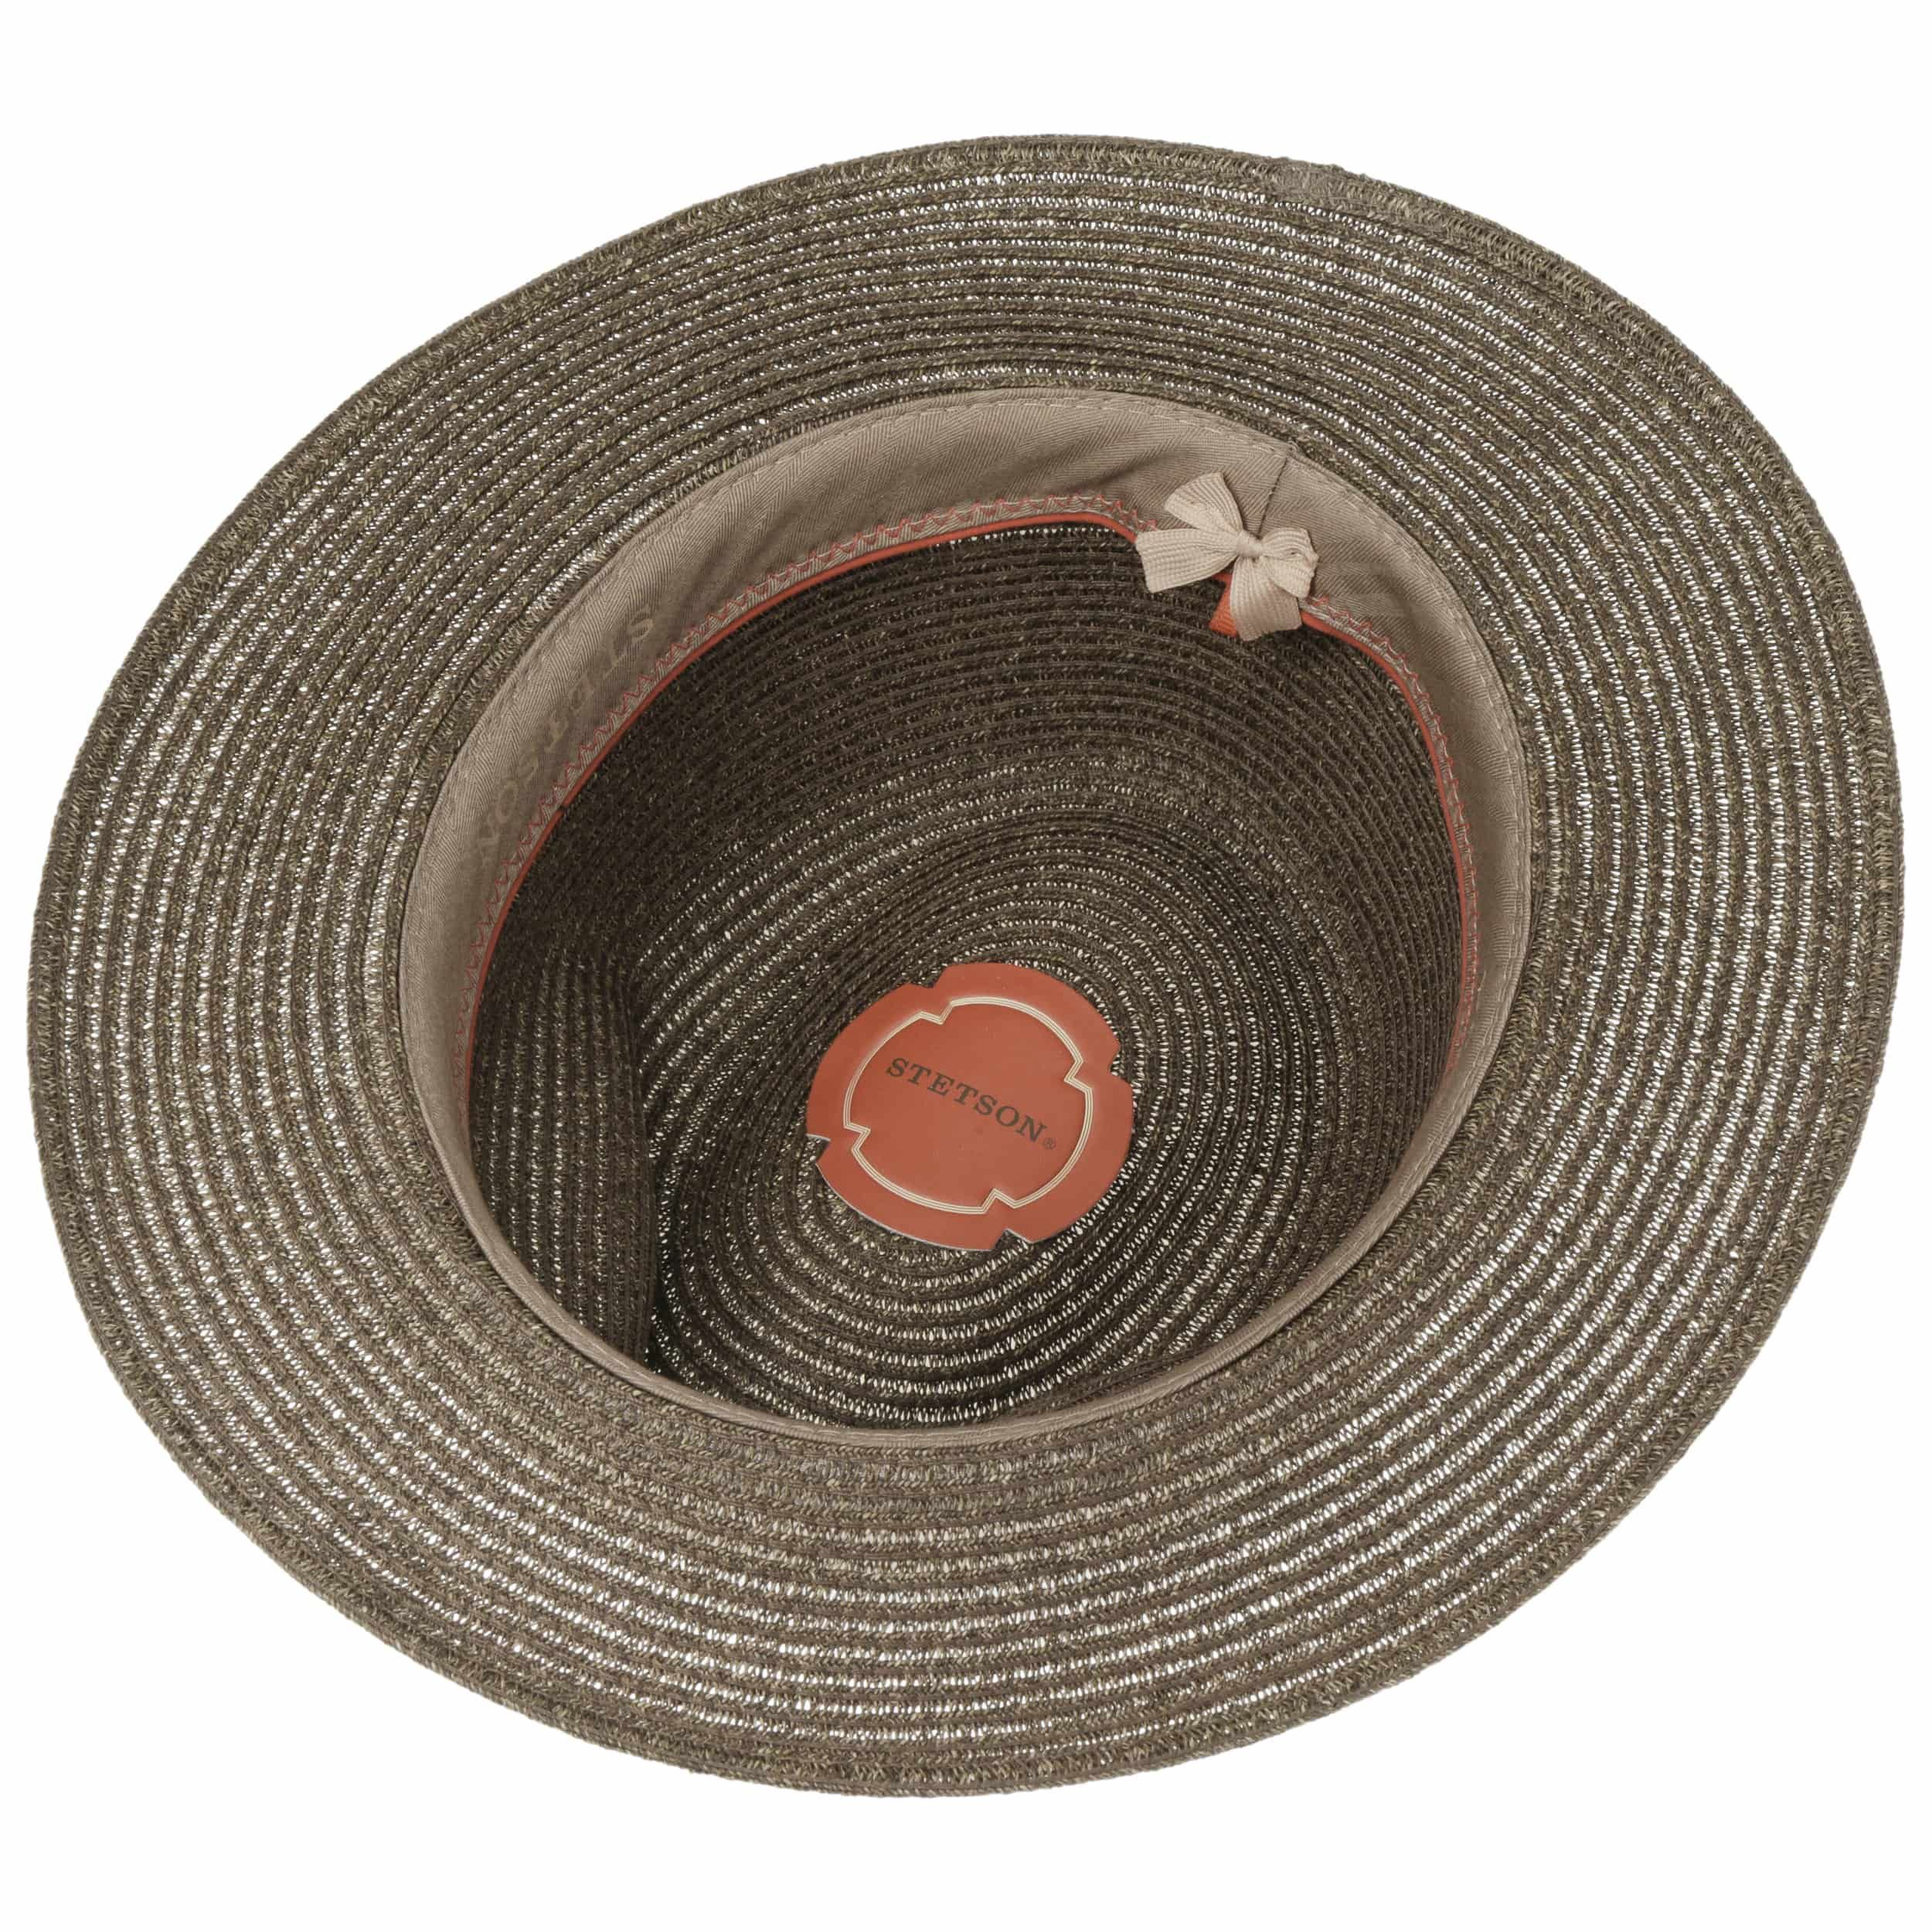 Chapeau en Paille Nark Toyo marron